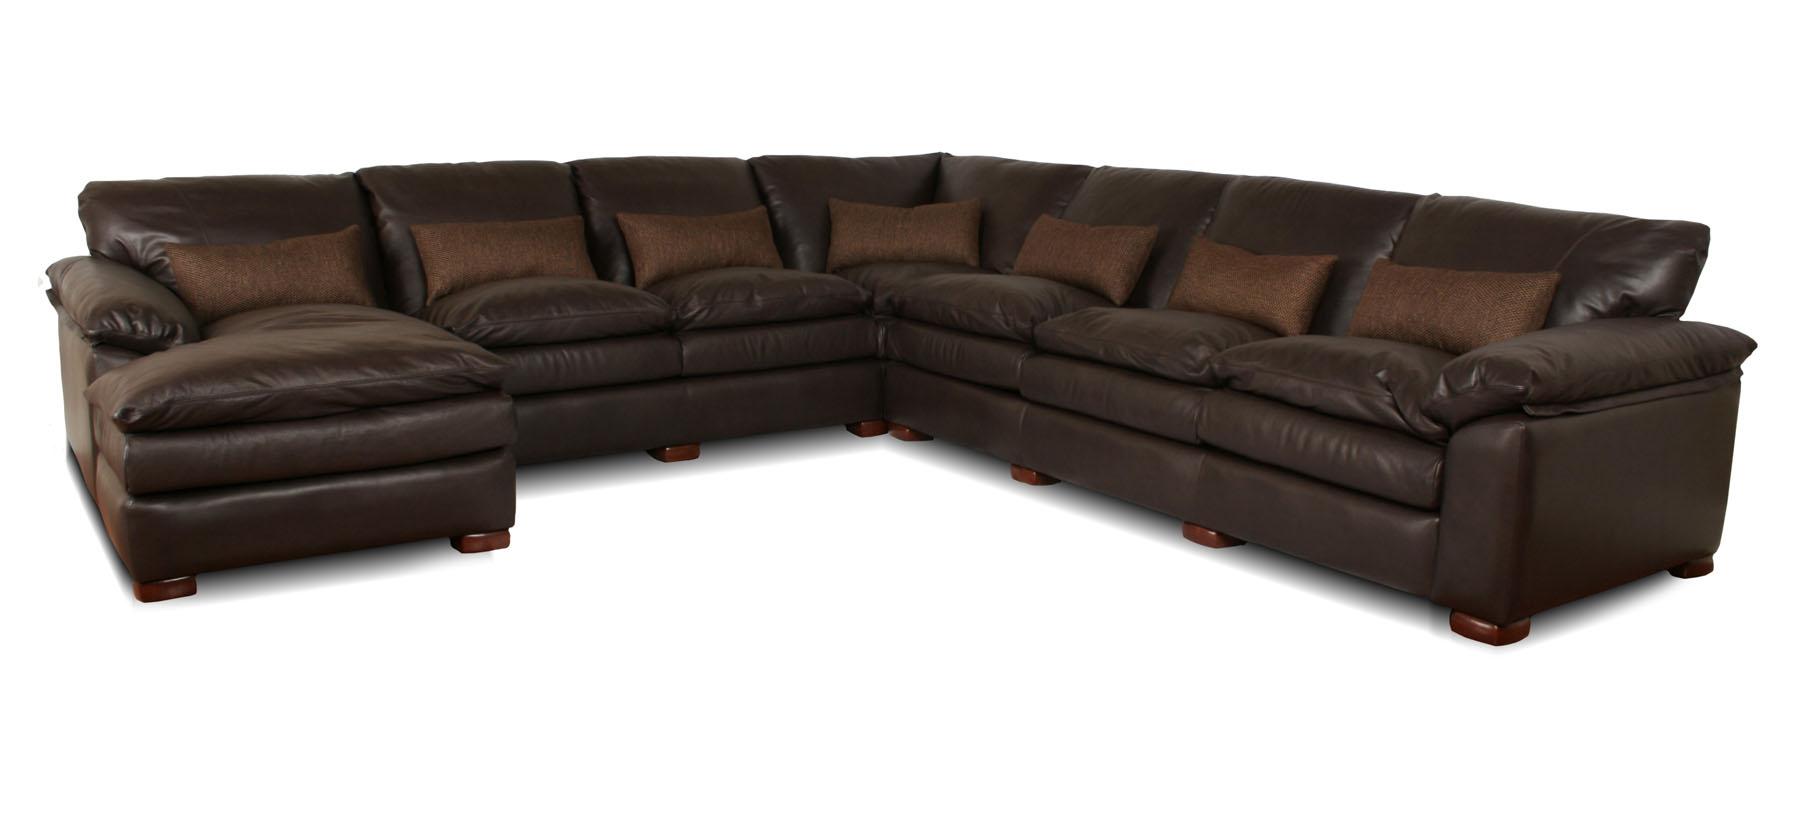 Geneva deep leather sectional Deep sectional sofa